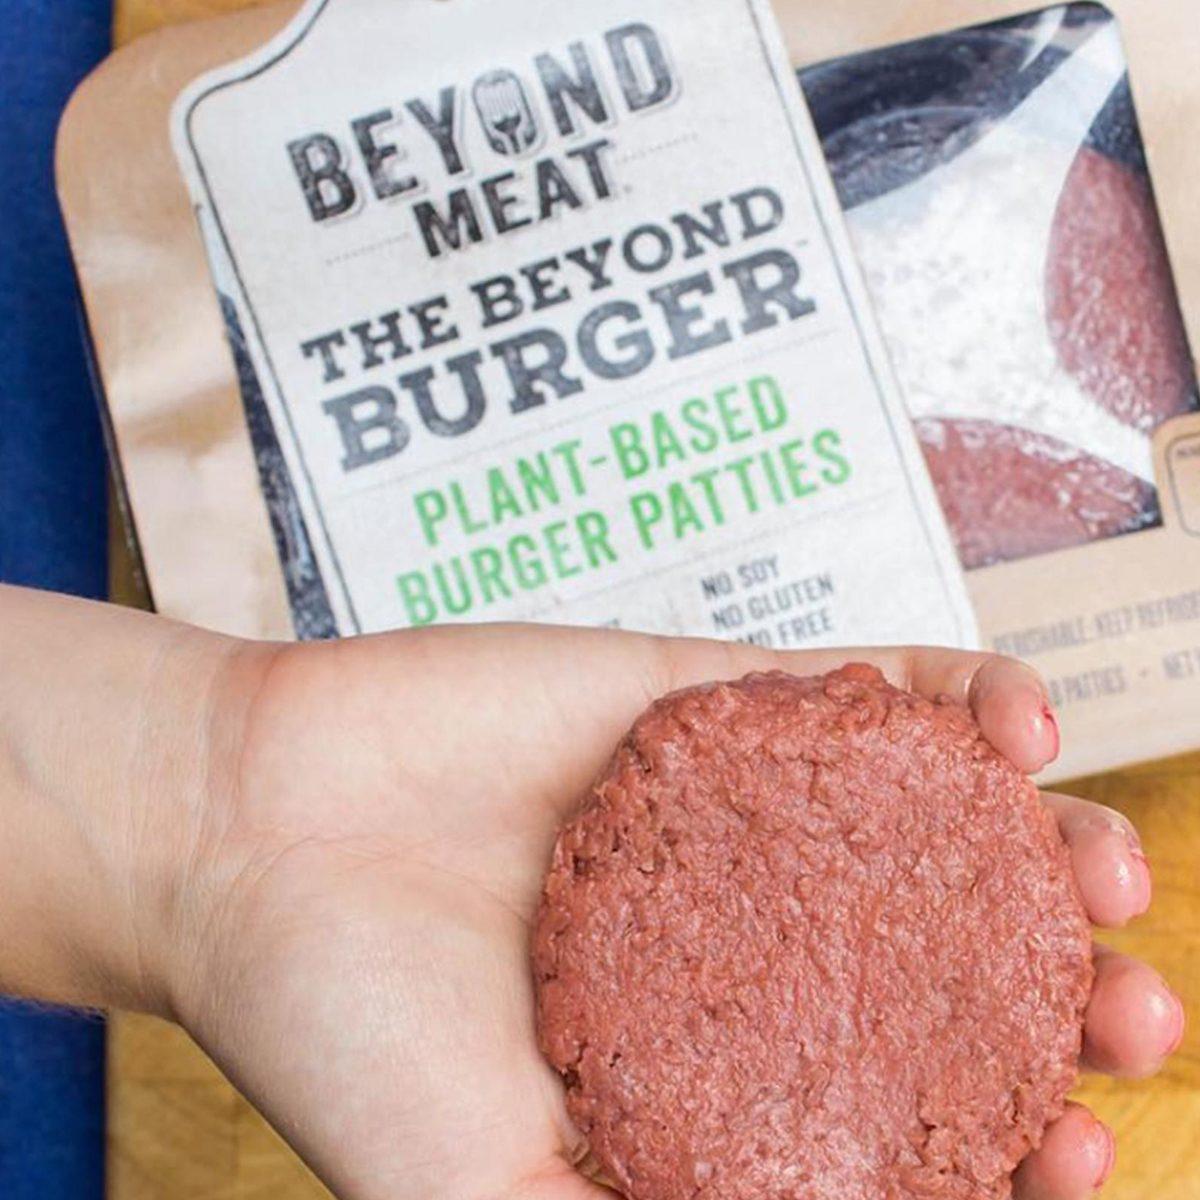 Beyond burger patty